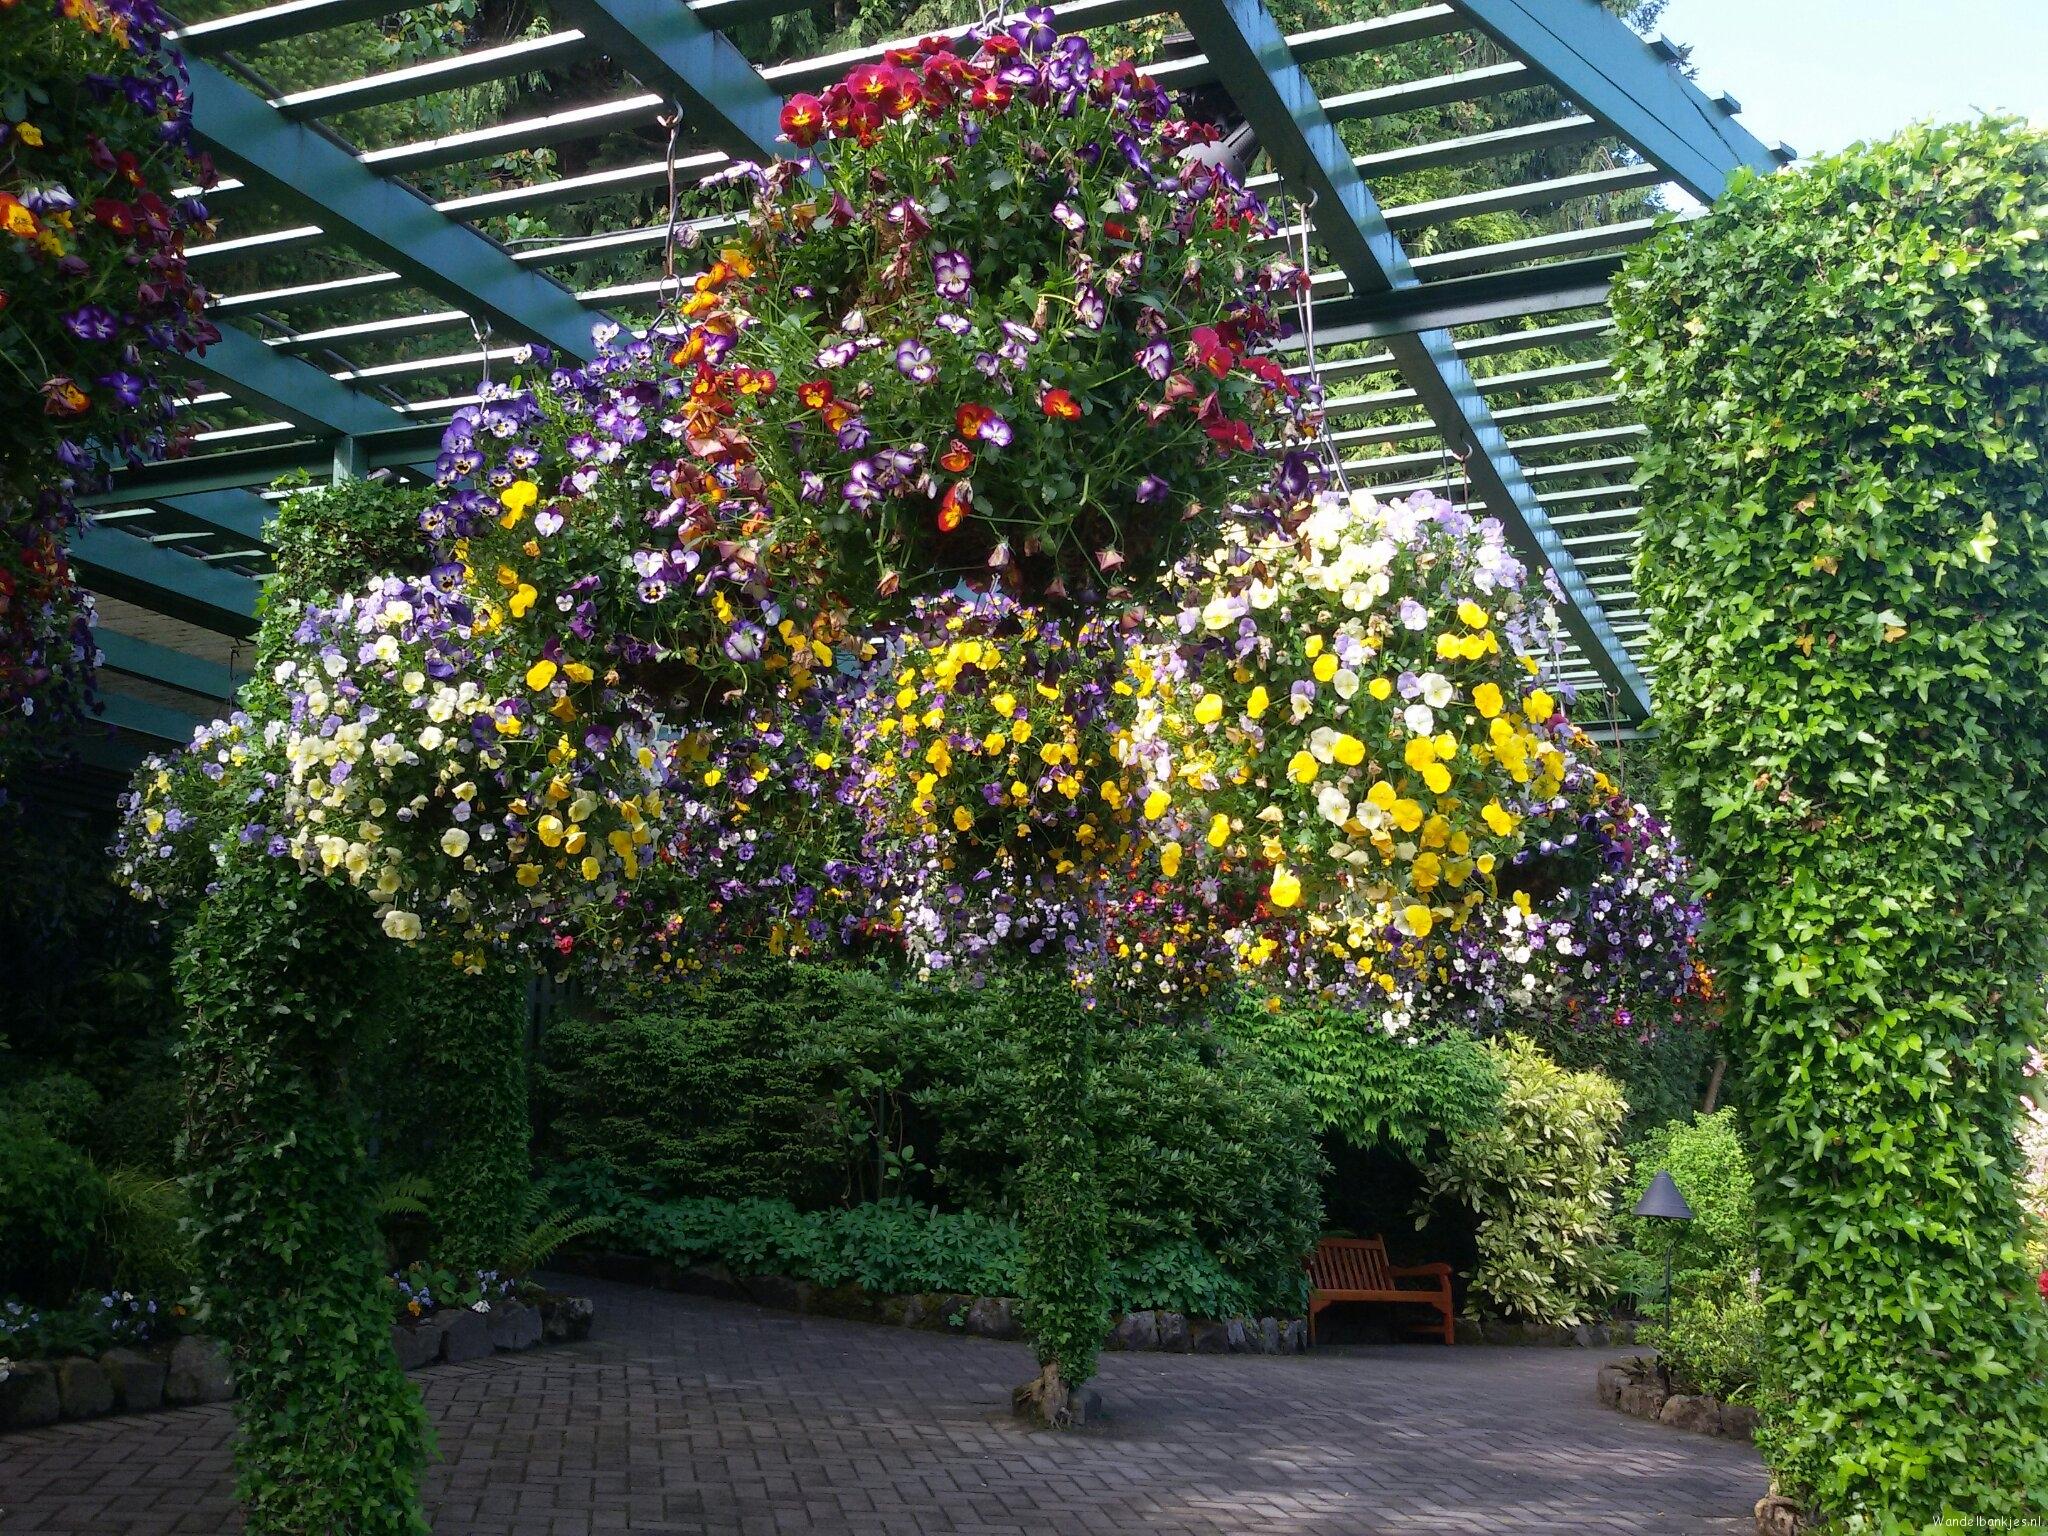 rt-mvandm-wandelbankjes-walkersbenches-beautiful-butchart-gardens-vancouver-island-canada-https-t-co-aqocijv7b6